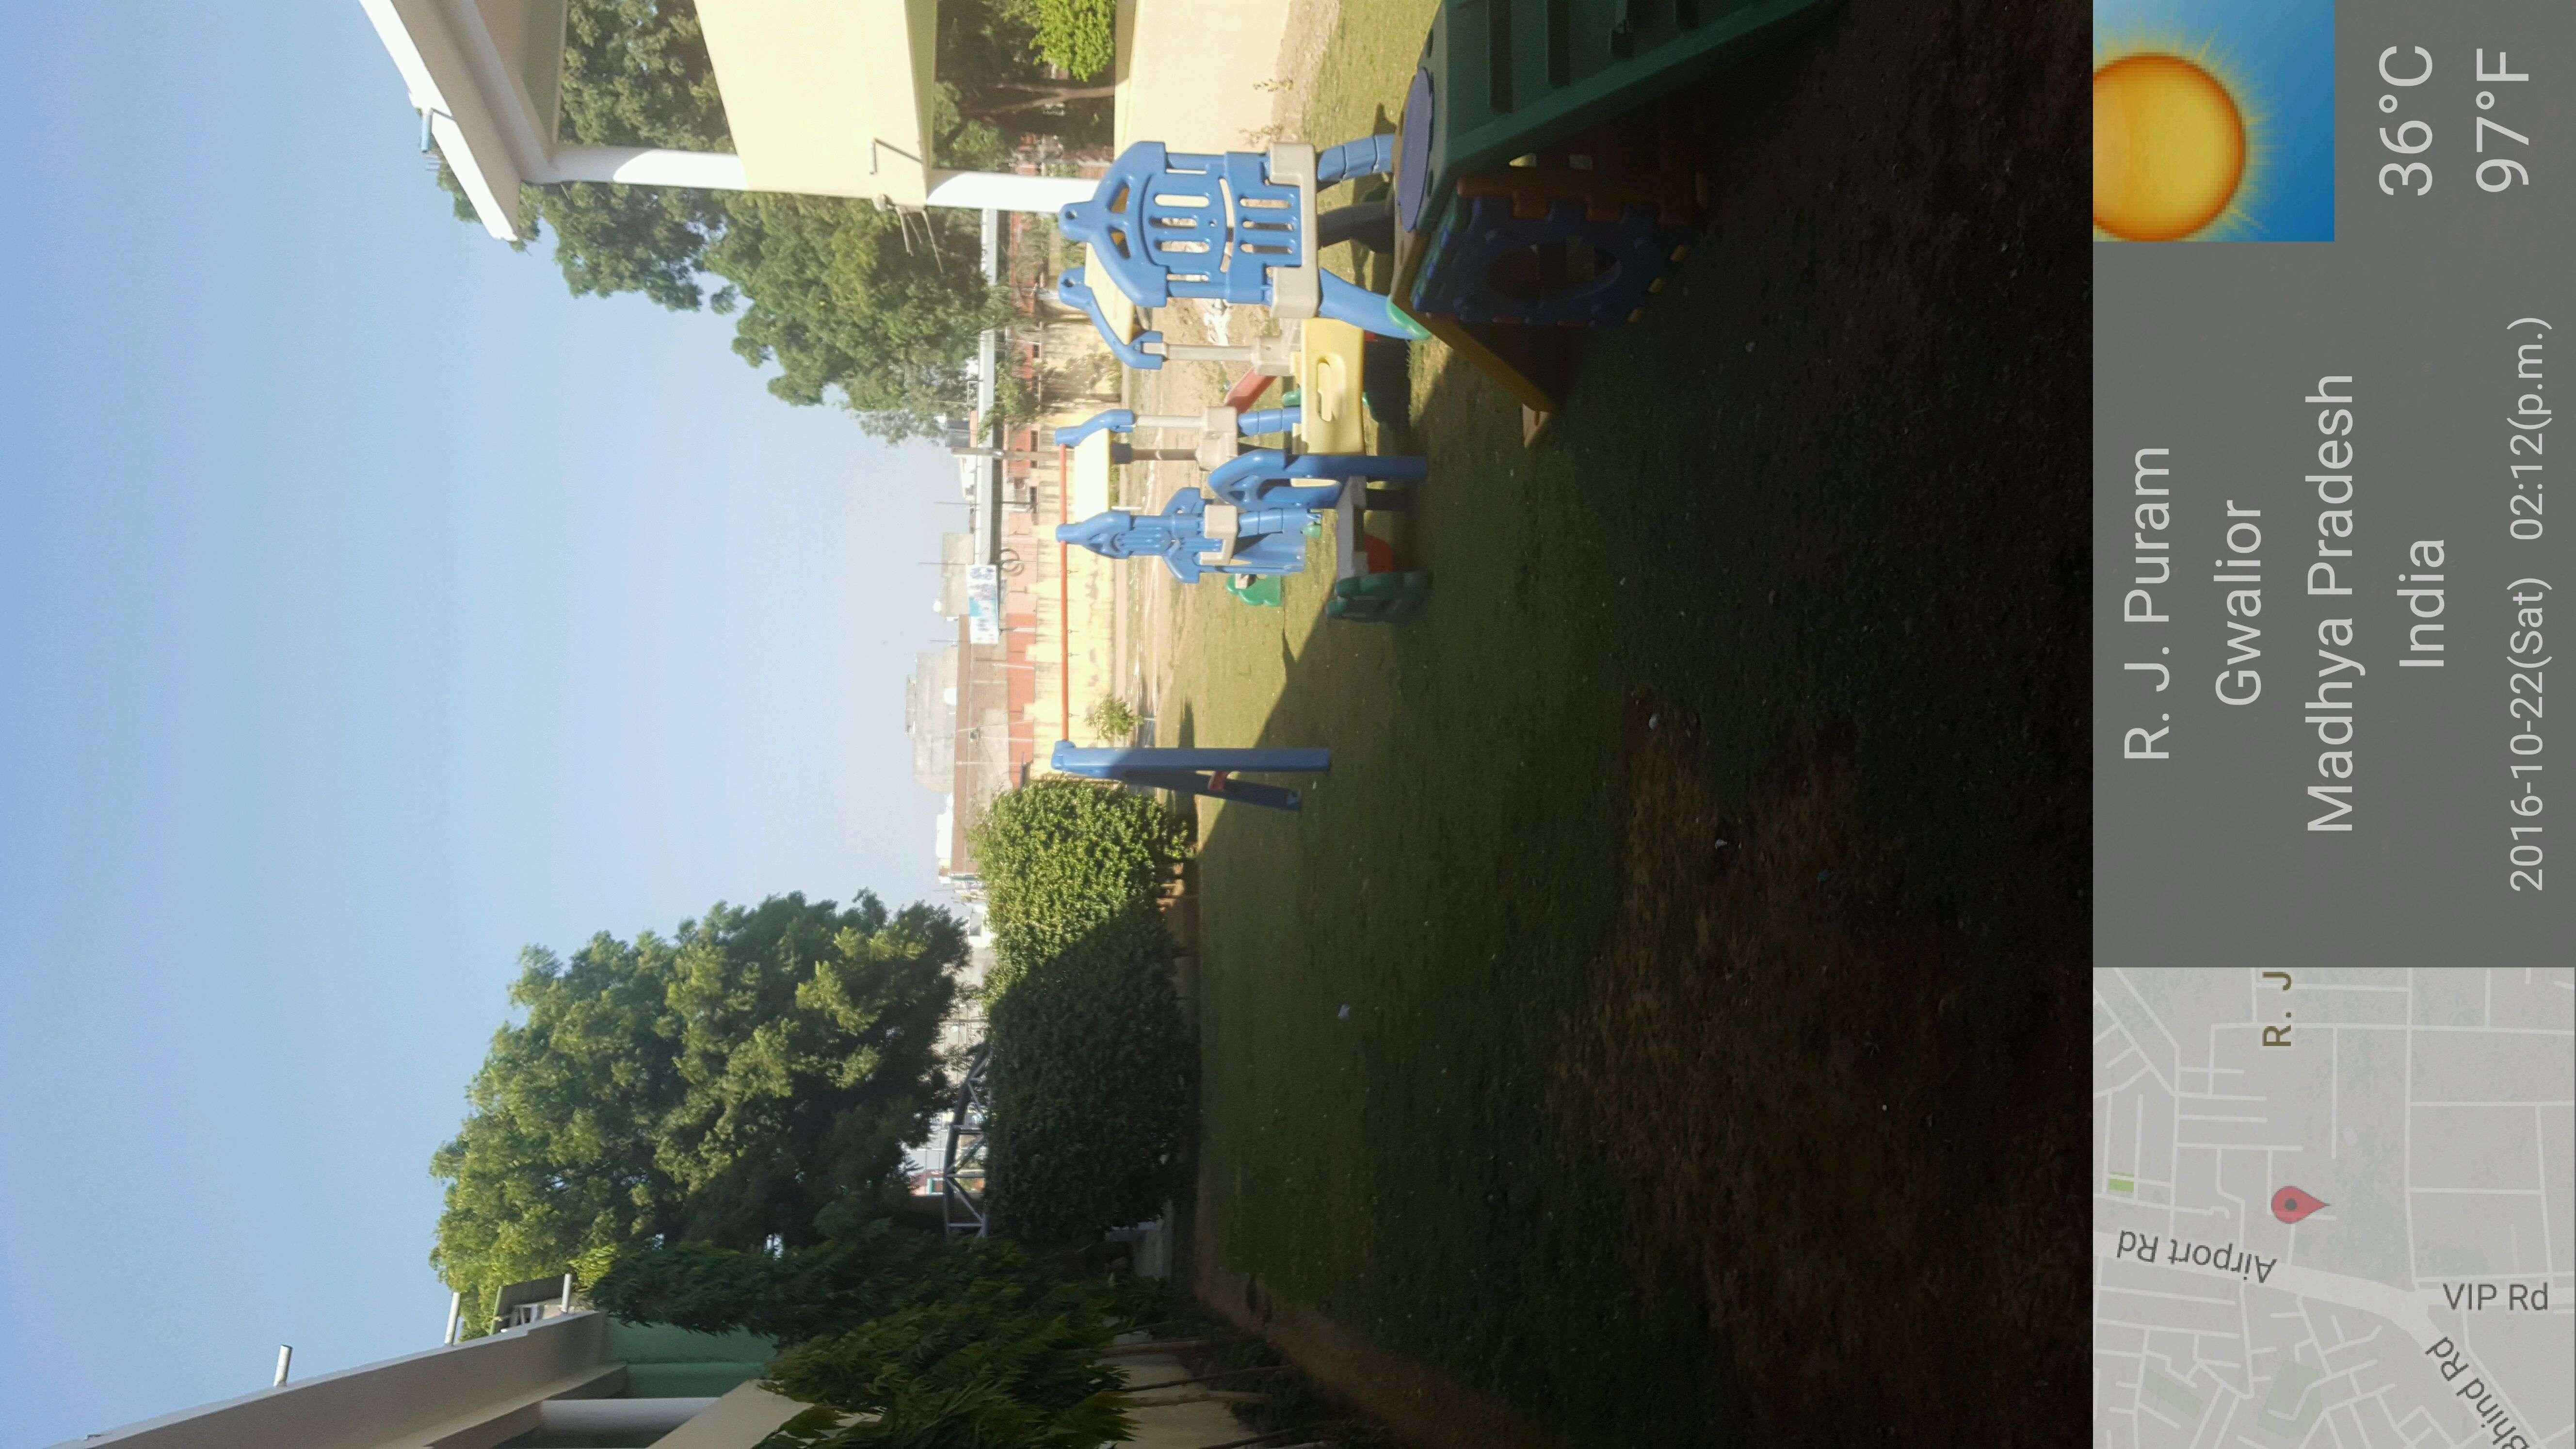 SWAMI VIVEKANANDA ACADEMY ABHILASHA BHAWAN R J PURAM MEHROTRA FARM BHIND ROAD 1030385